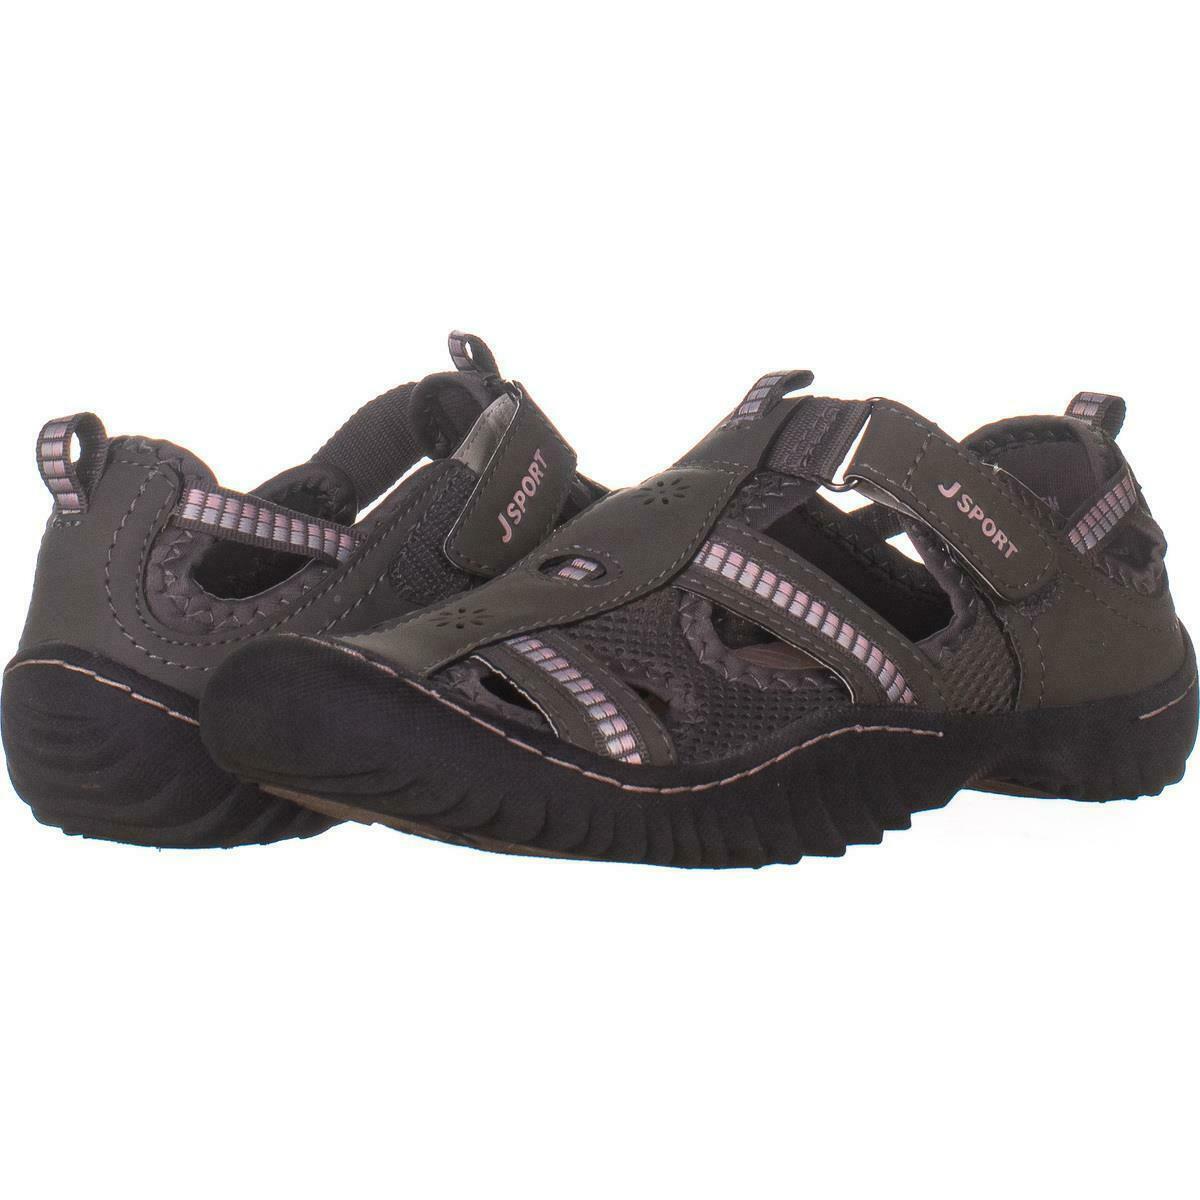 JBU by Jambu Sydney Memory Foam Ladies Flat Sandals Gray Sizes 7 7.5 8 8.5 9 10